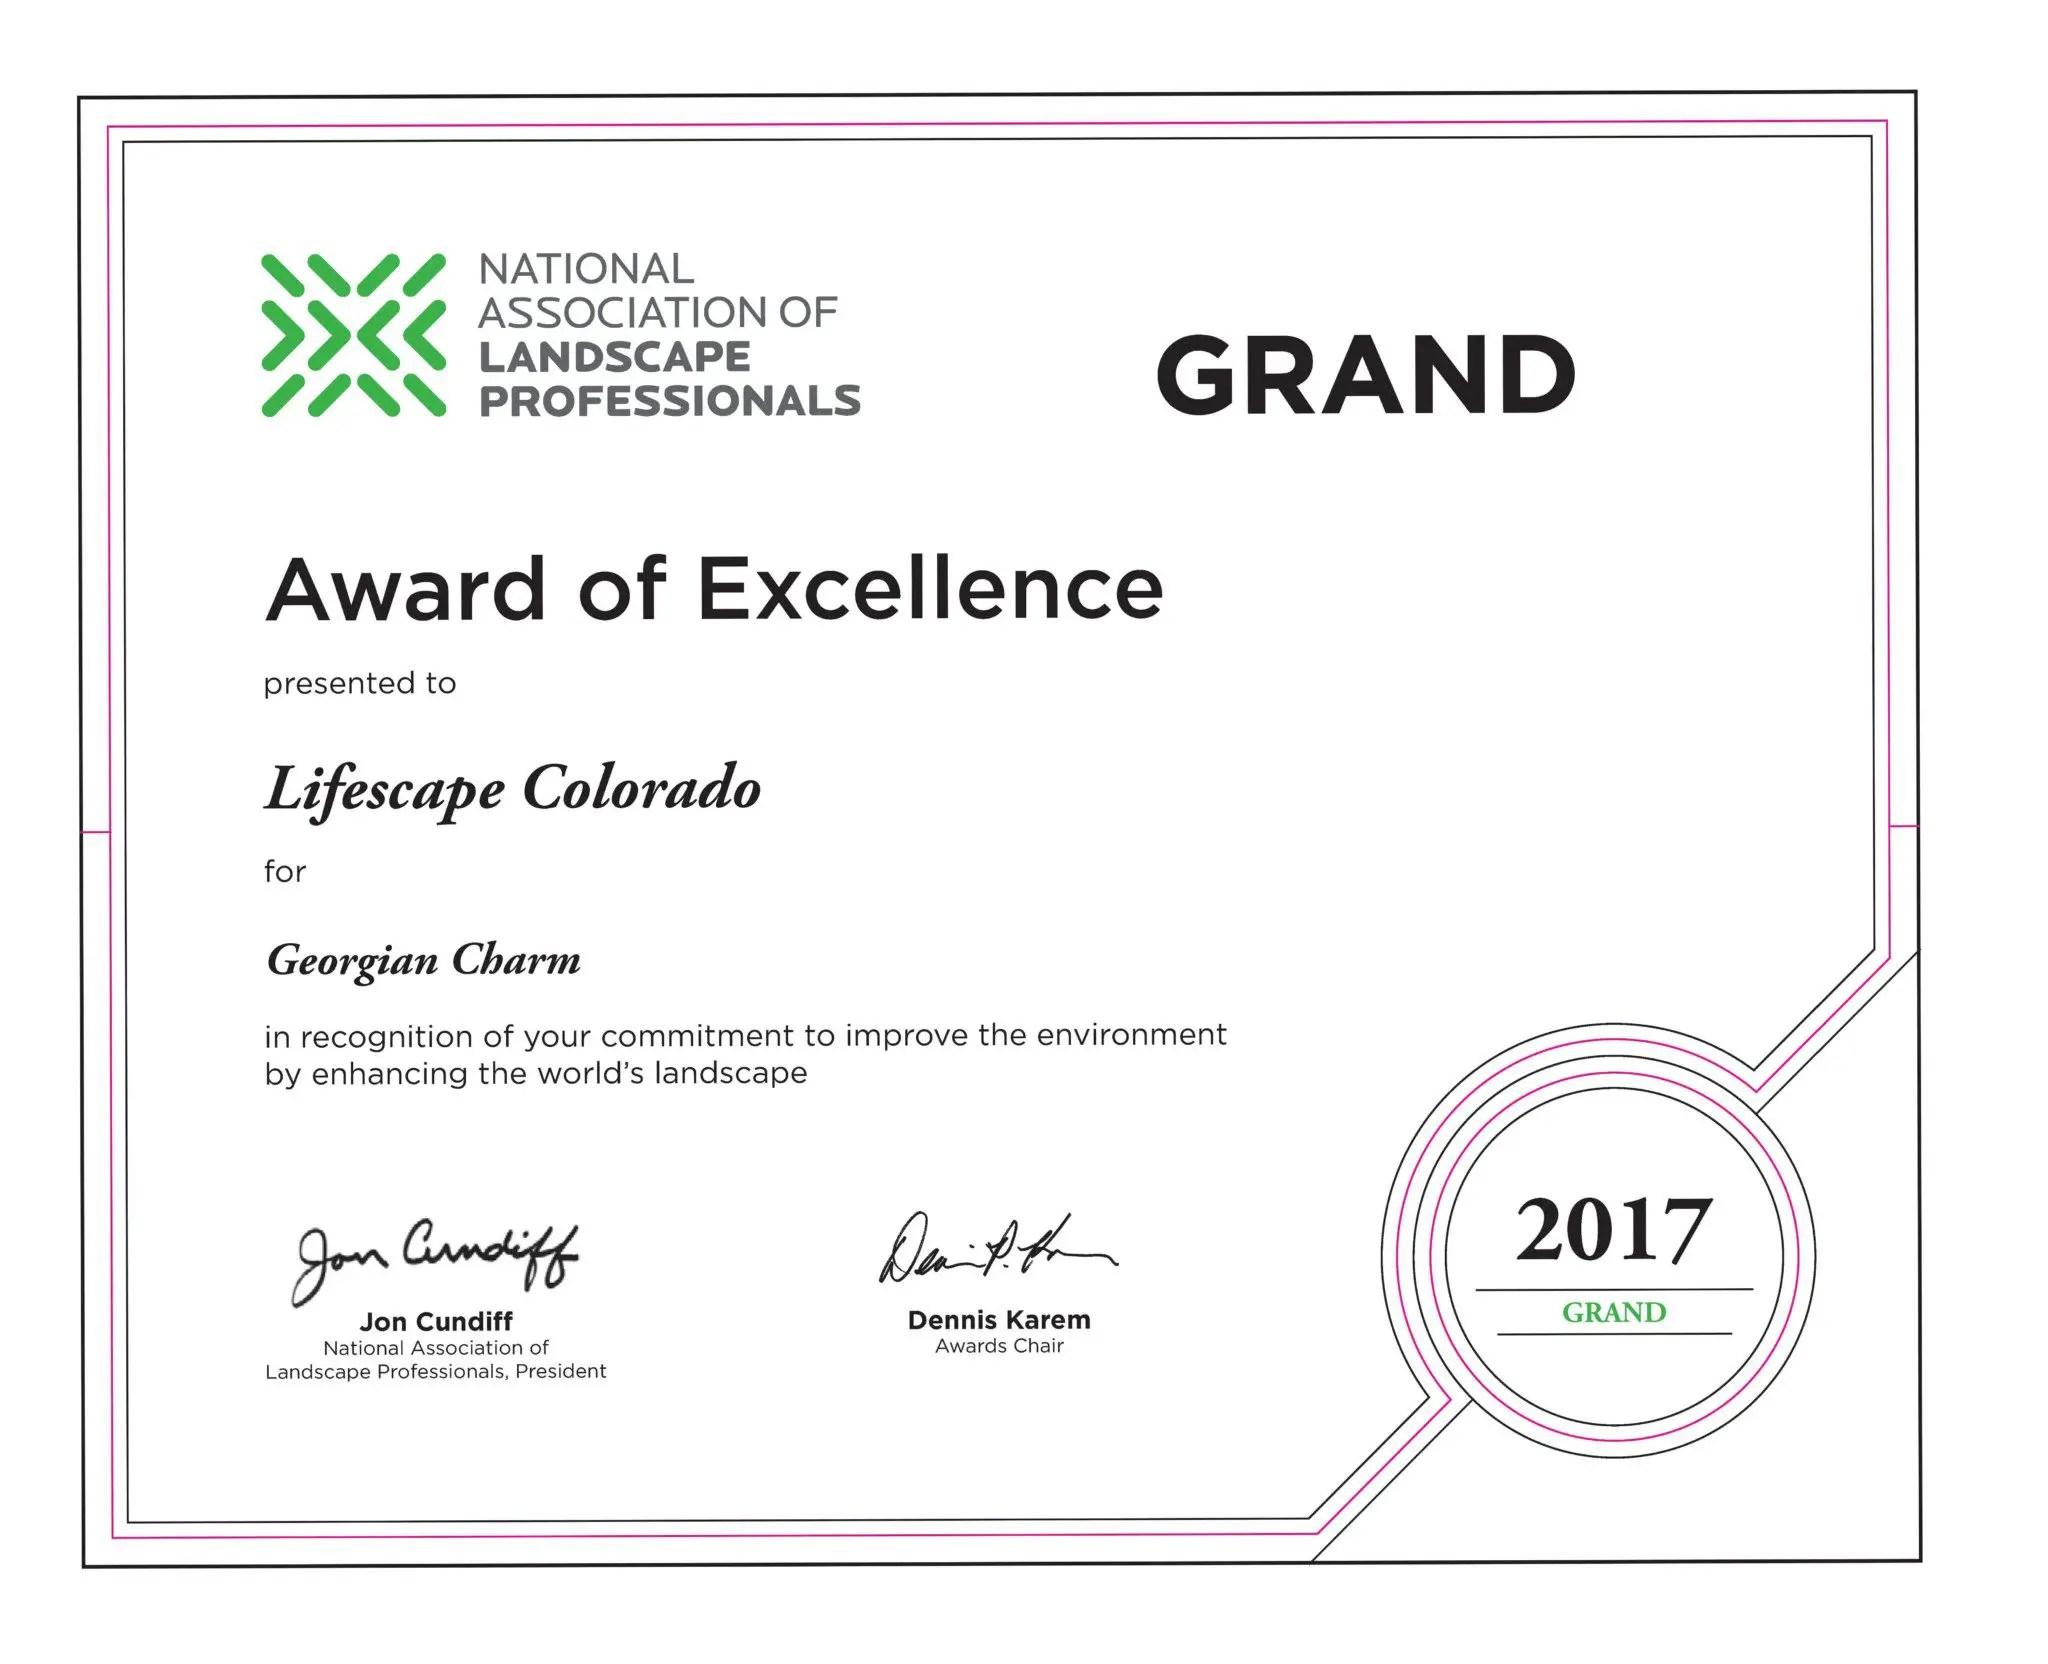 awards recognition lifescape colorado